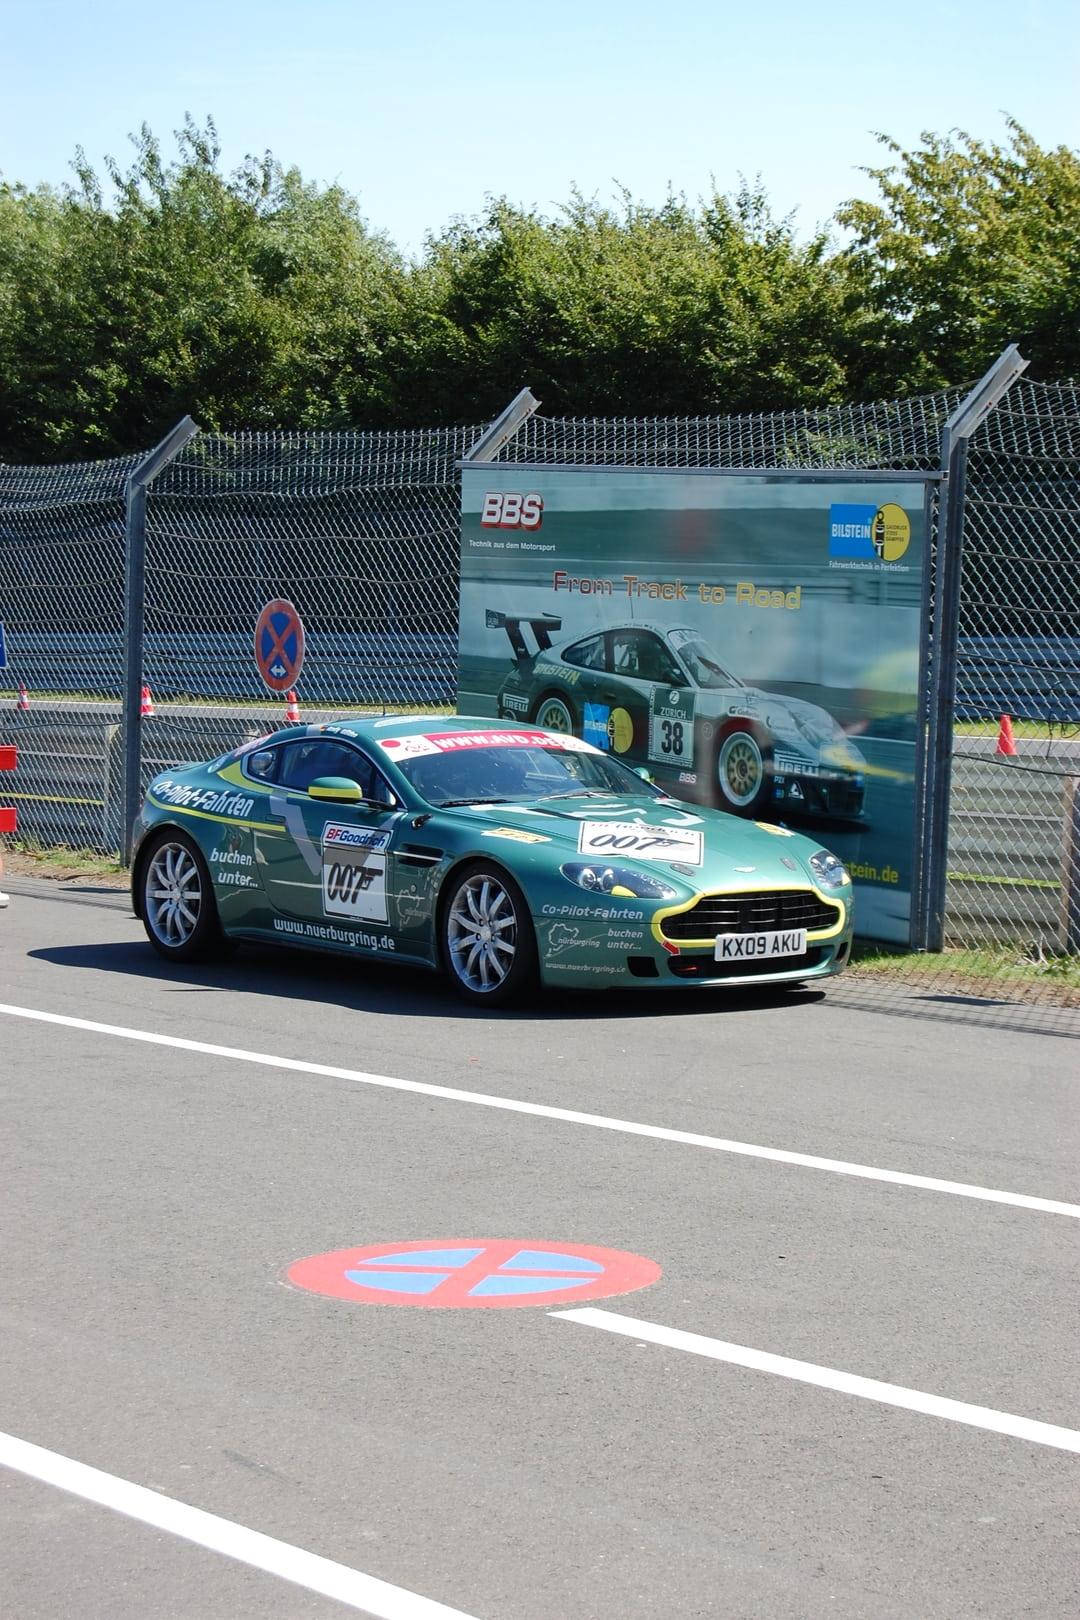 Aston Martin V8 Vantage N24: